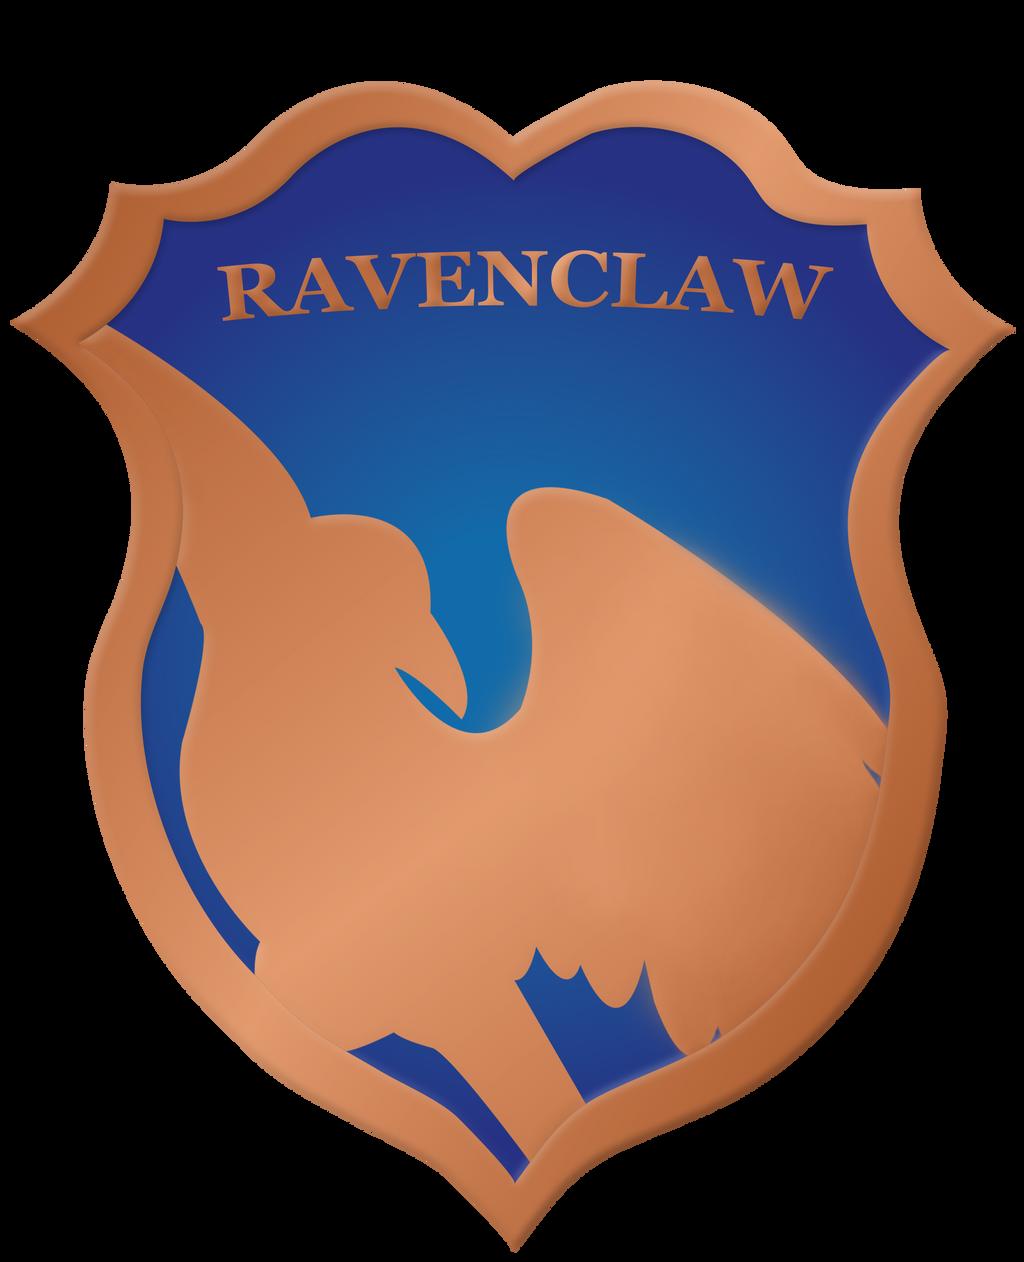 Ravenclaw Crest Badge by rainbowrenly on DeviantArt